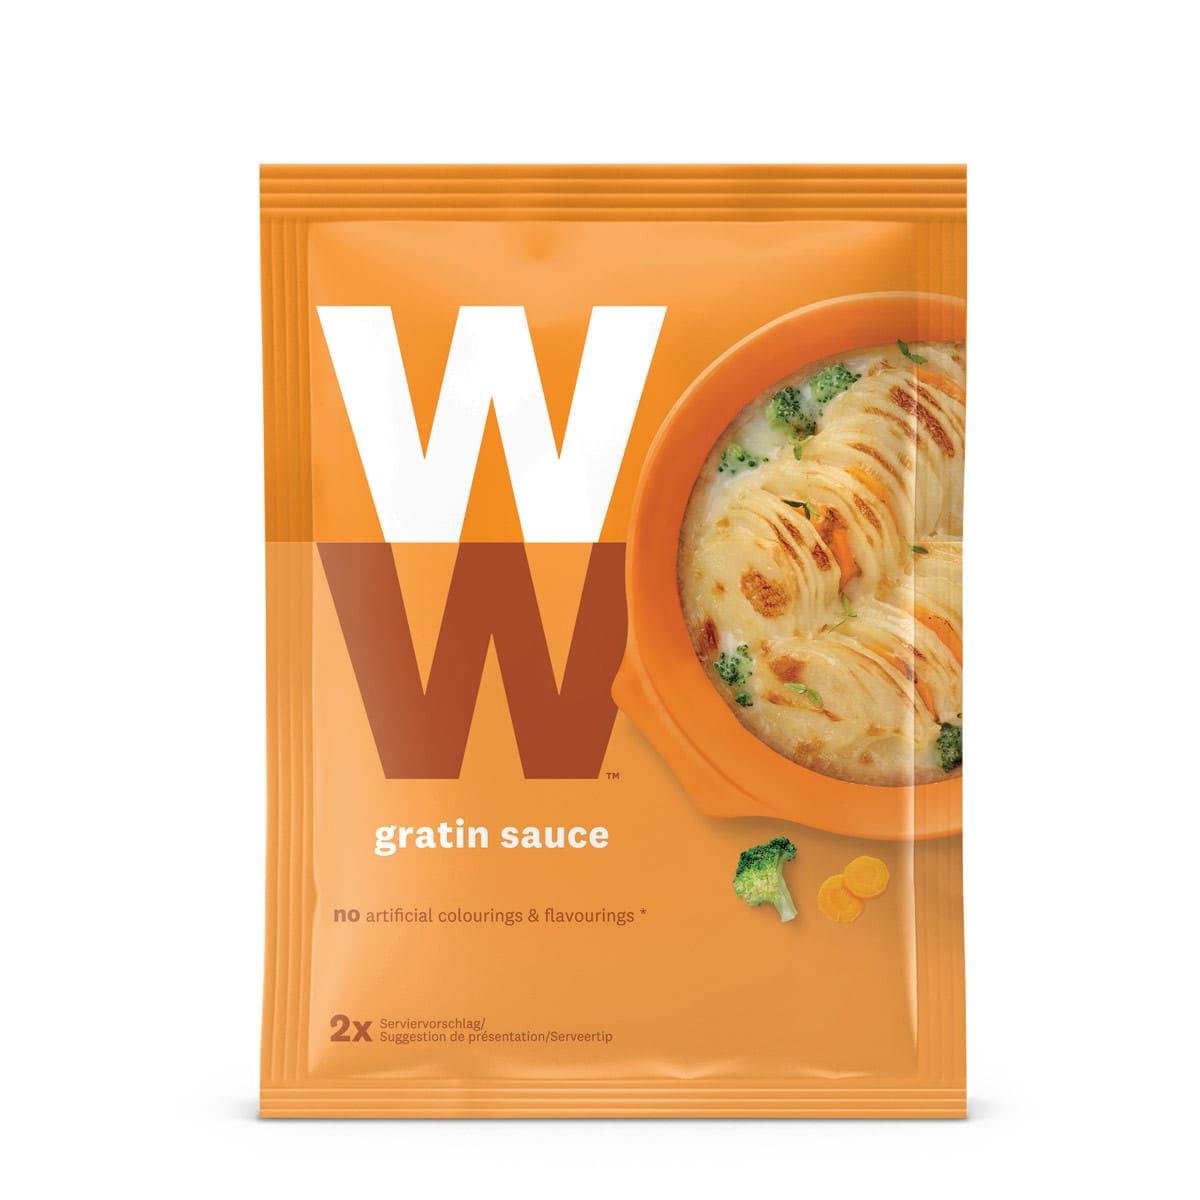 WW Sauce à gratin – 4 au prix de 3 2